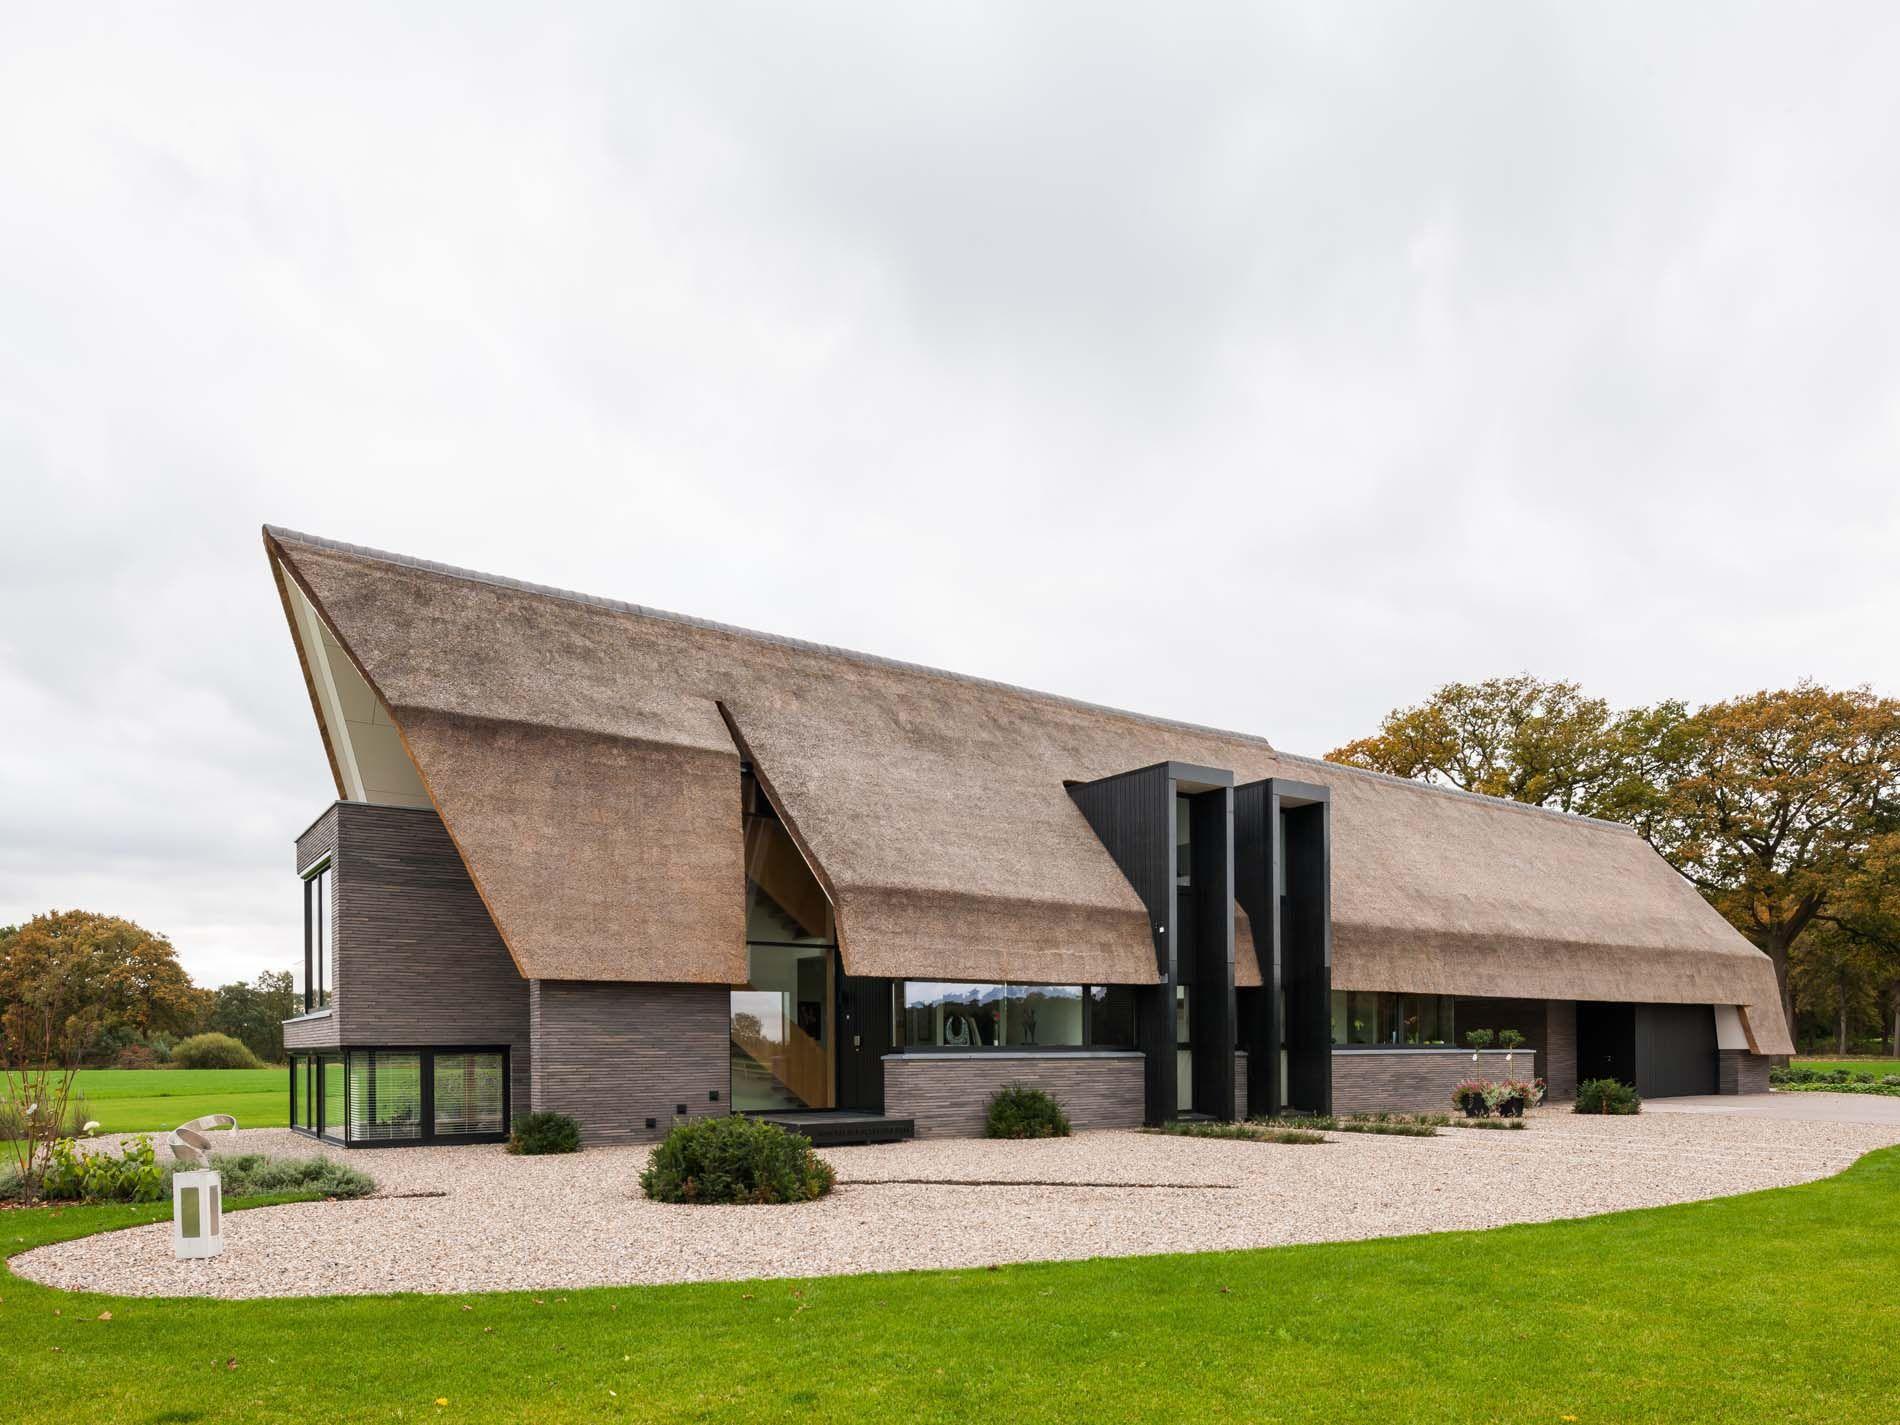 Maas architecten woonhuis laren riet modern villa landelijk schuur houten trap modern - Huis architect hout ...